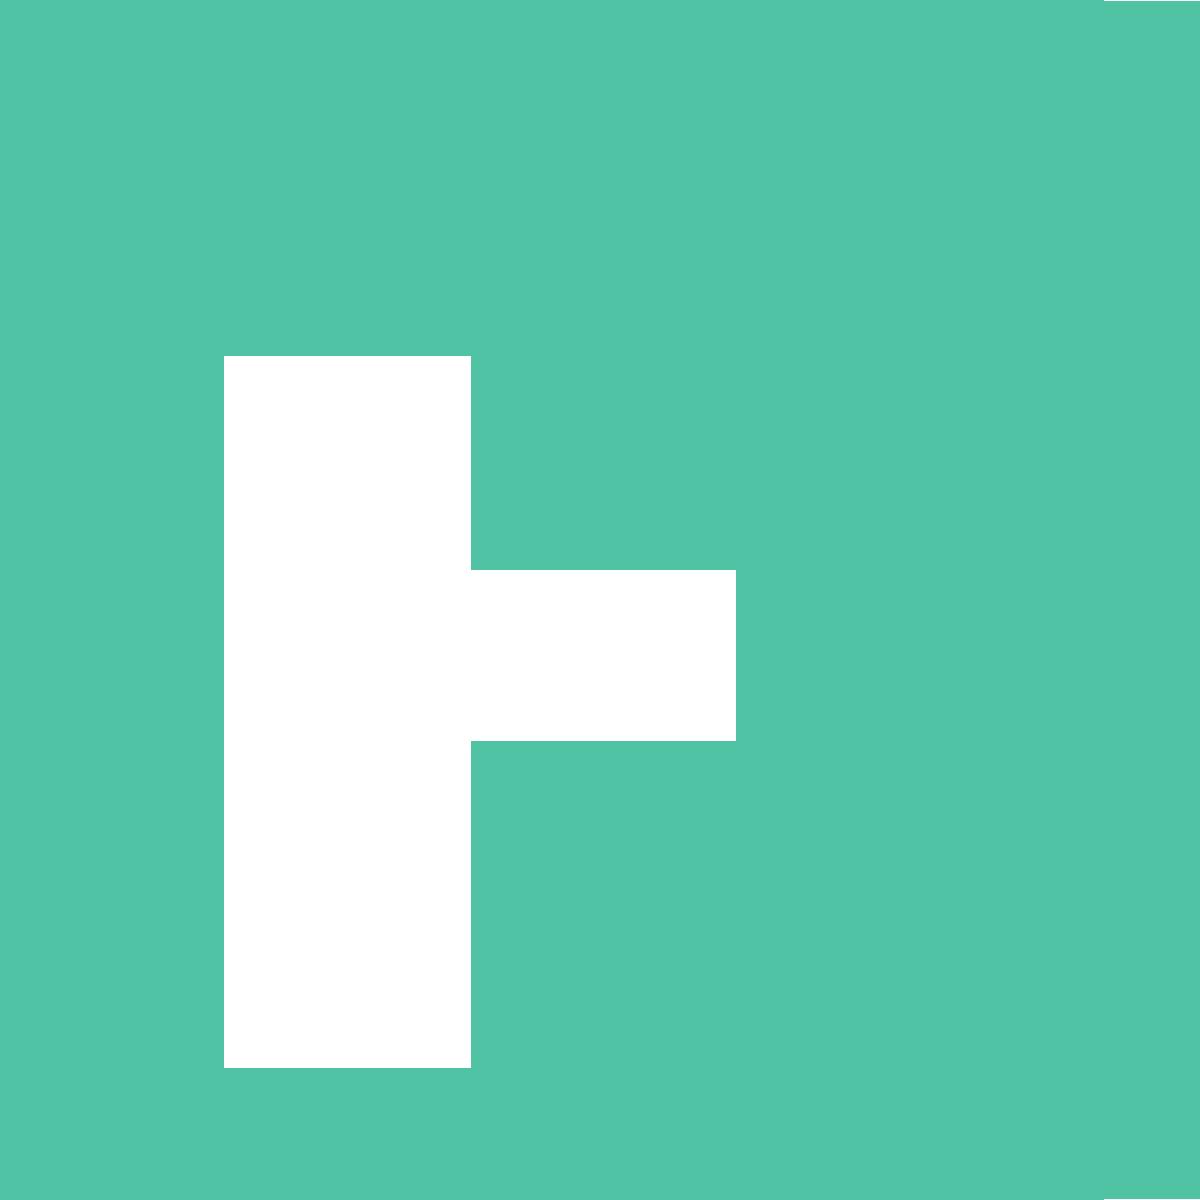 Parking_hover-effect